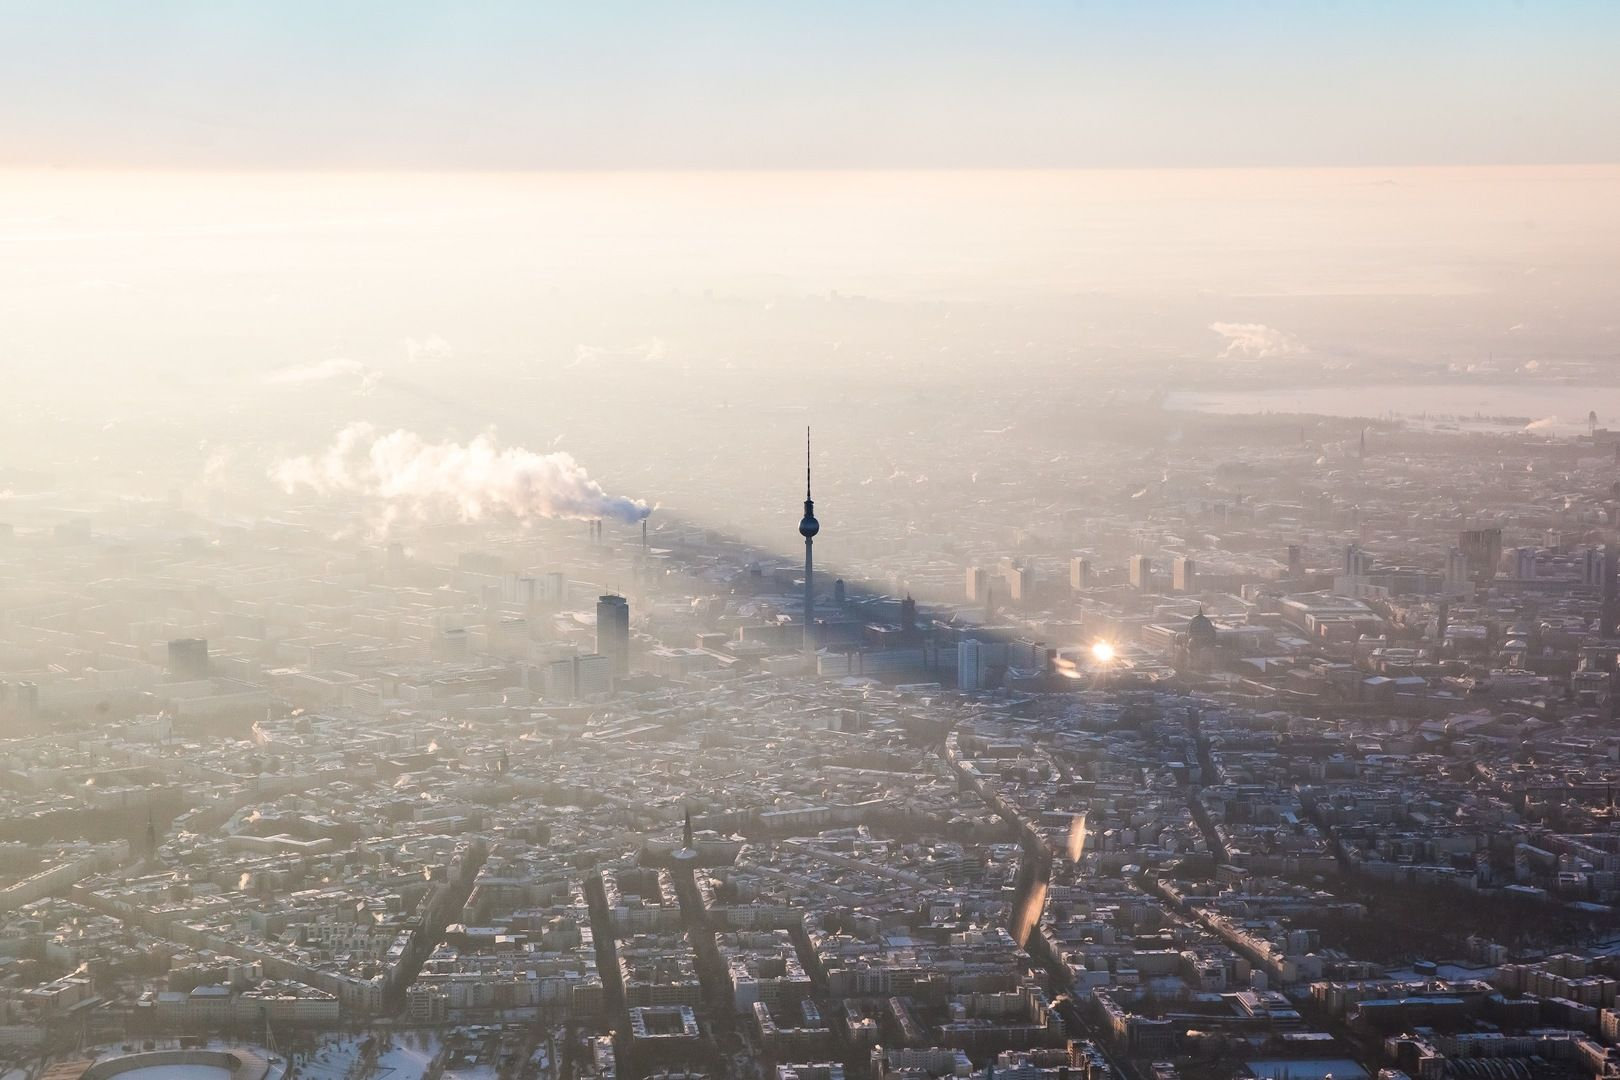 Berlin From Above Fog And Mist Over Cities Always Make Them More Like A Fairytale Schone Orte Berlin Bilder Bilder